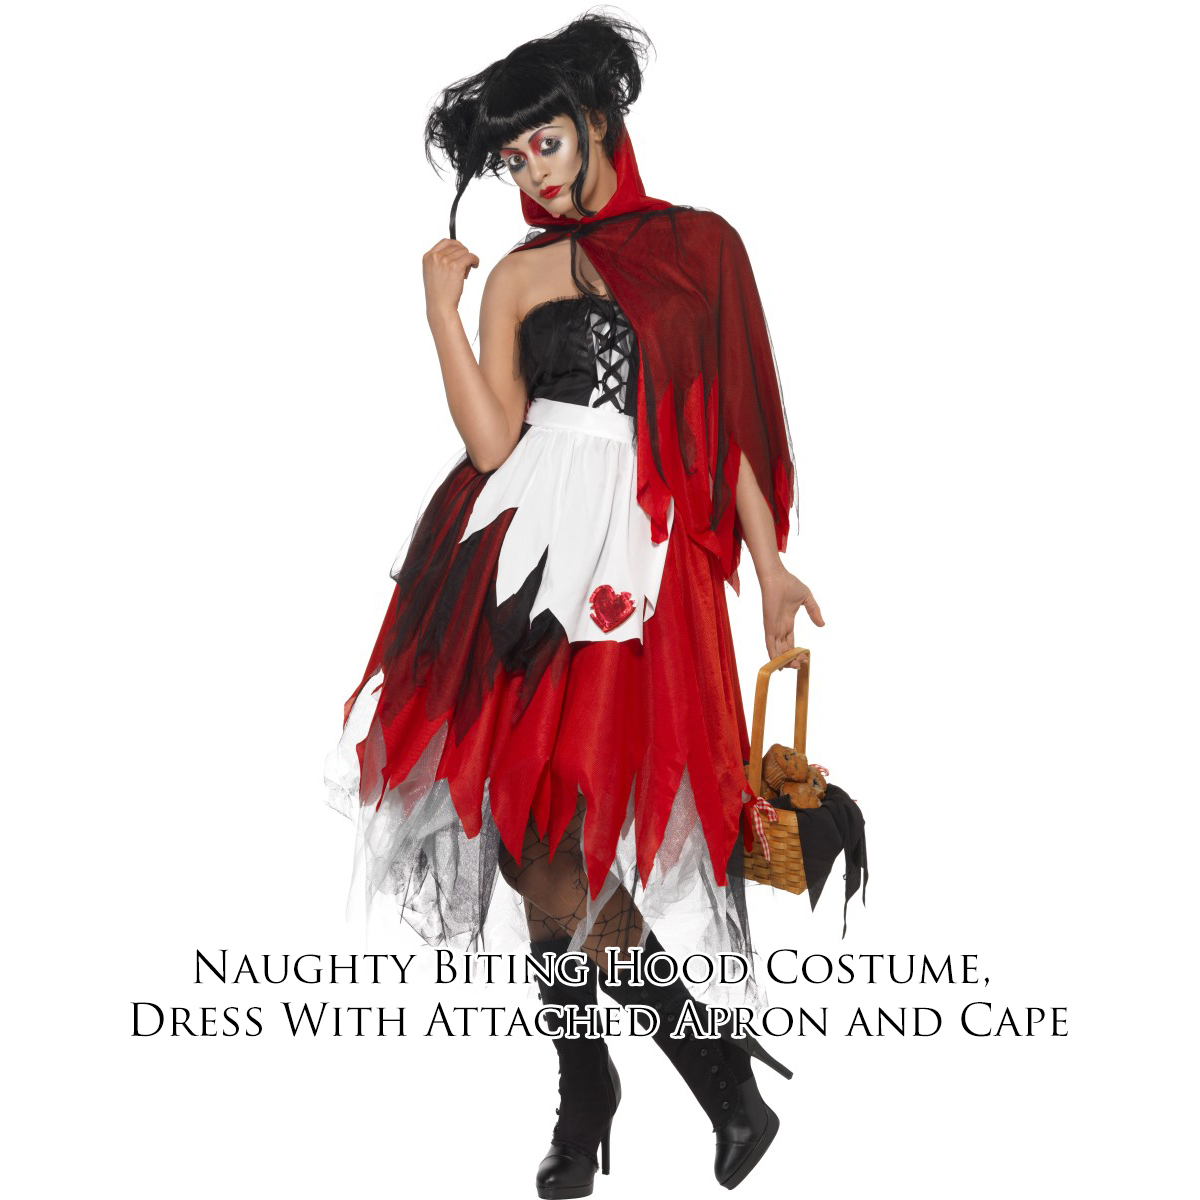 Femmes Halloween Déguisement Sexy dhorreur girl costume